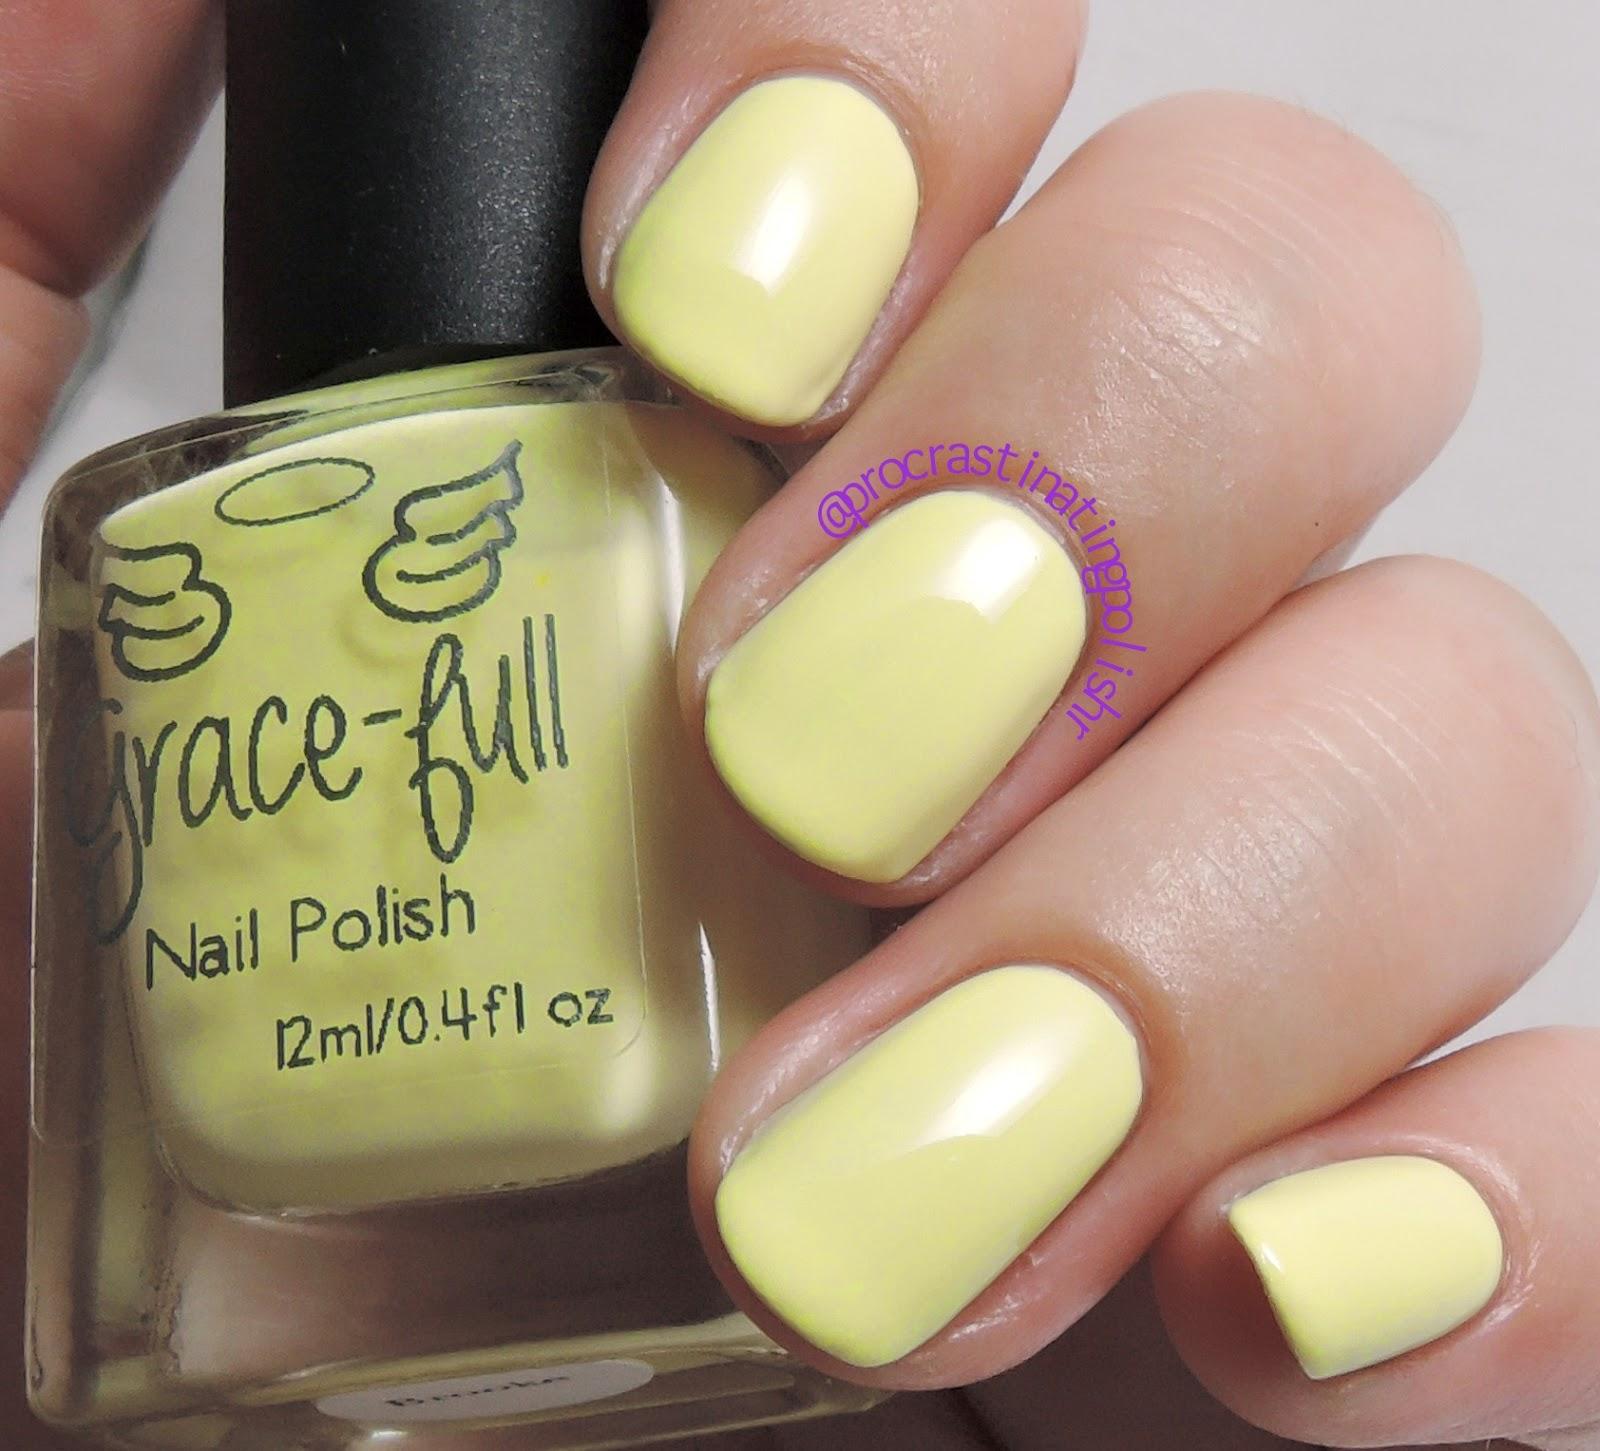 Grace-full Nail Polish - Brooke | Dreamy Beach